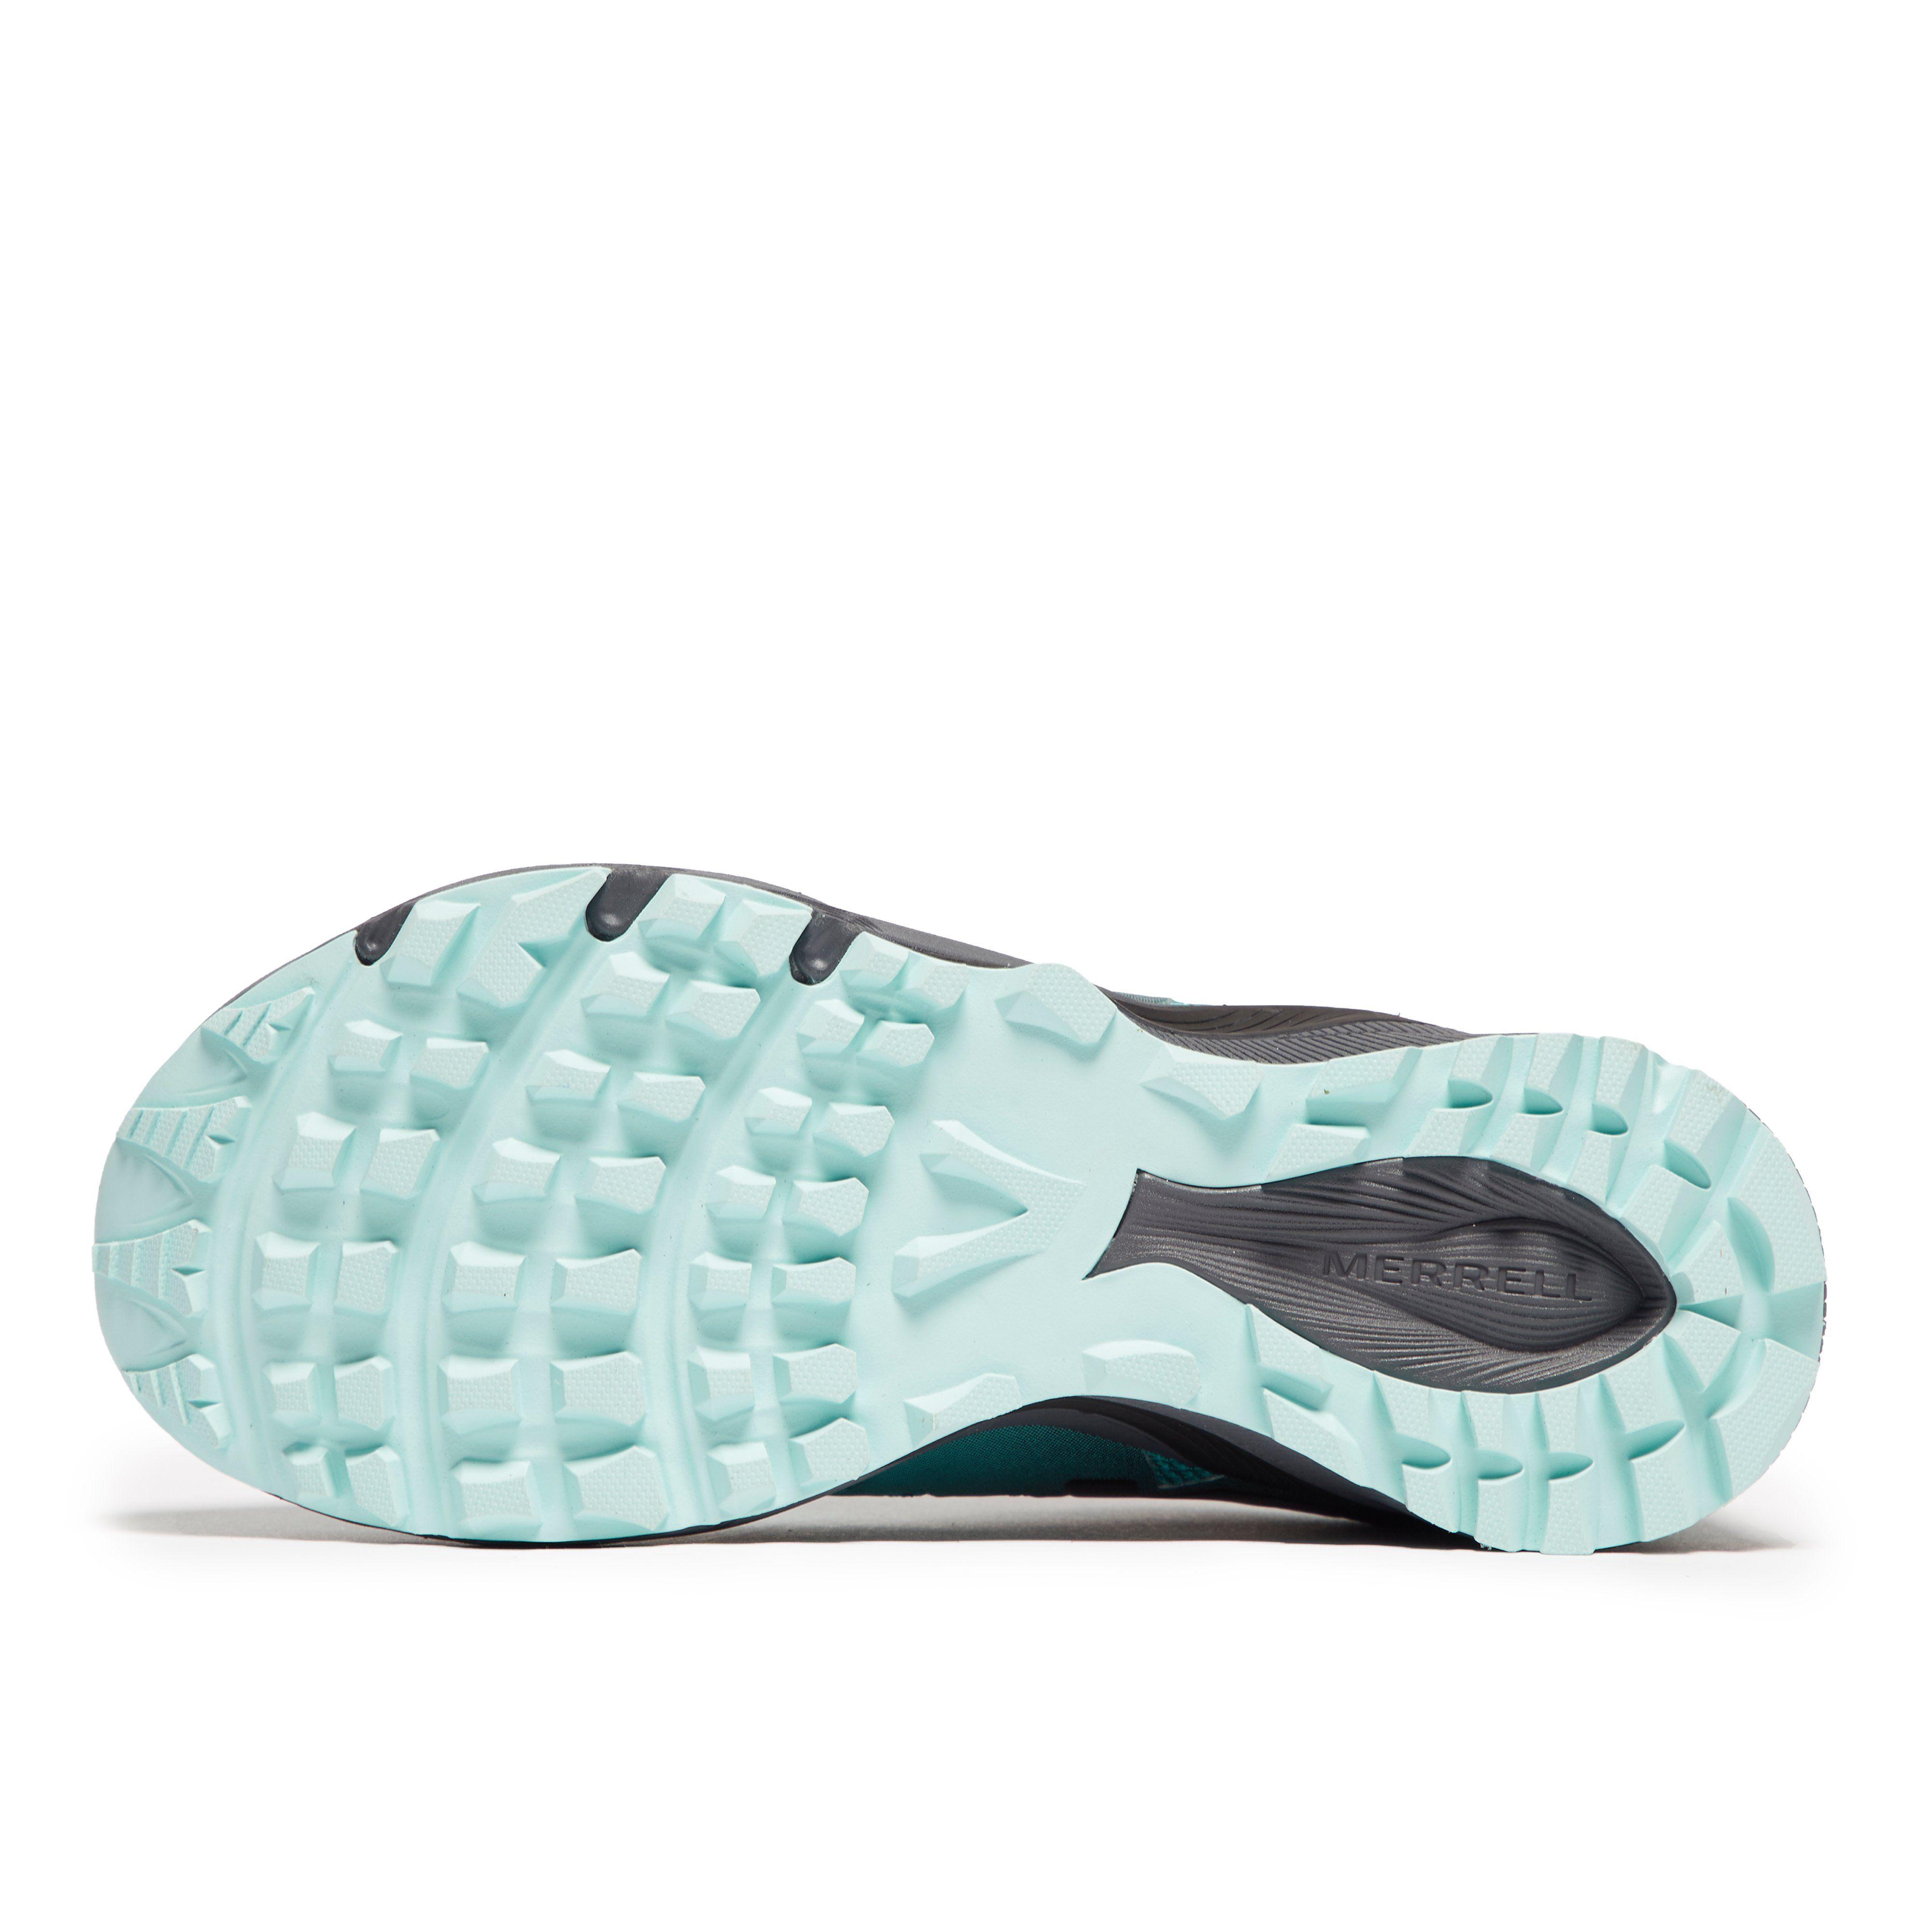 Merrell Agility Peak Flex 2 GTX Women's Trail Running Shoes